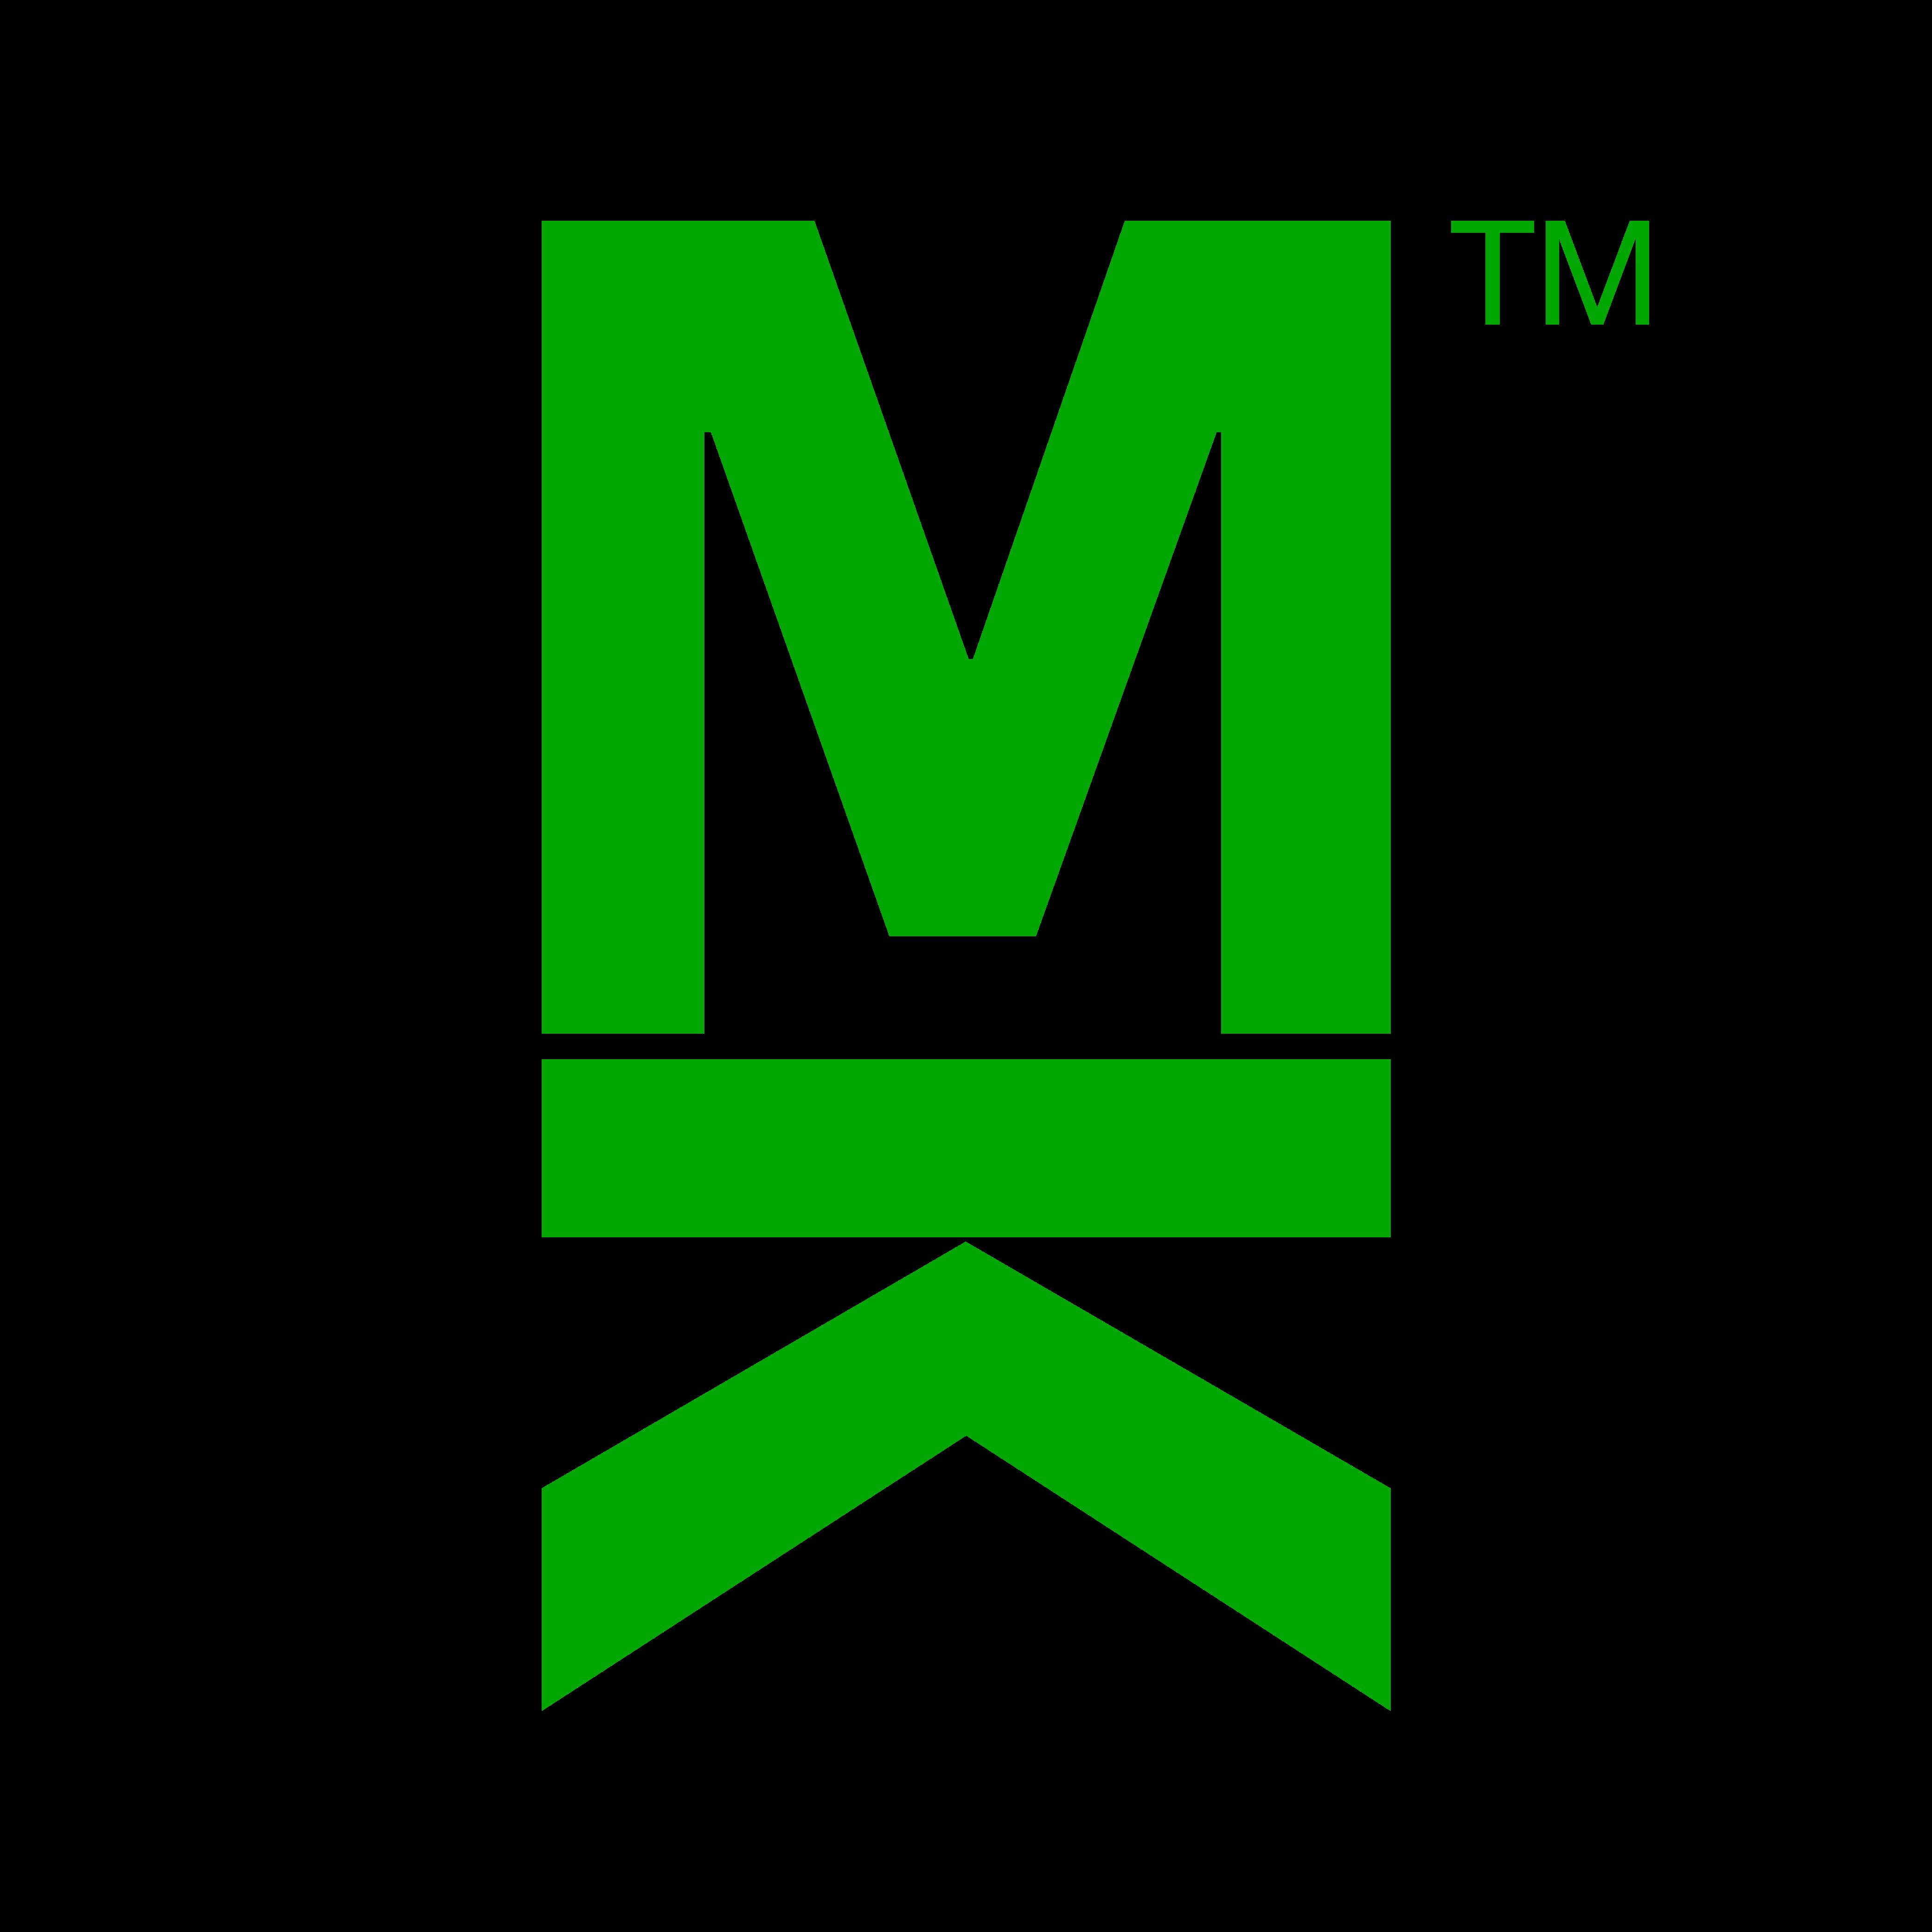 Maize Kraize Logo